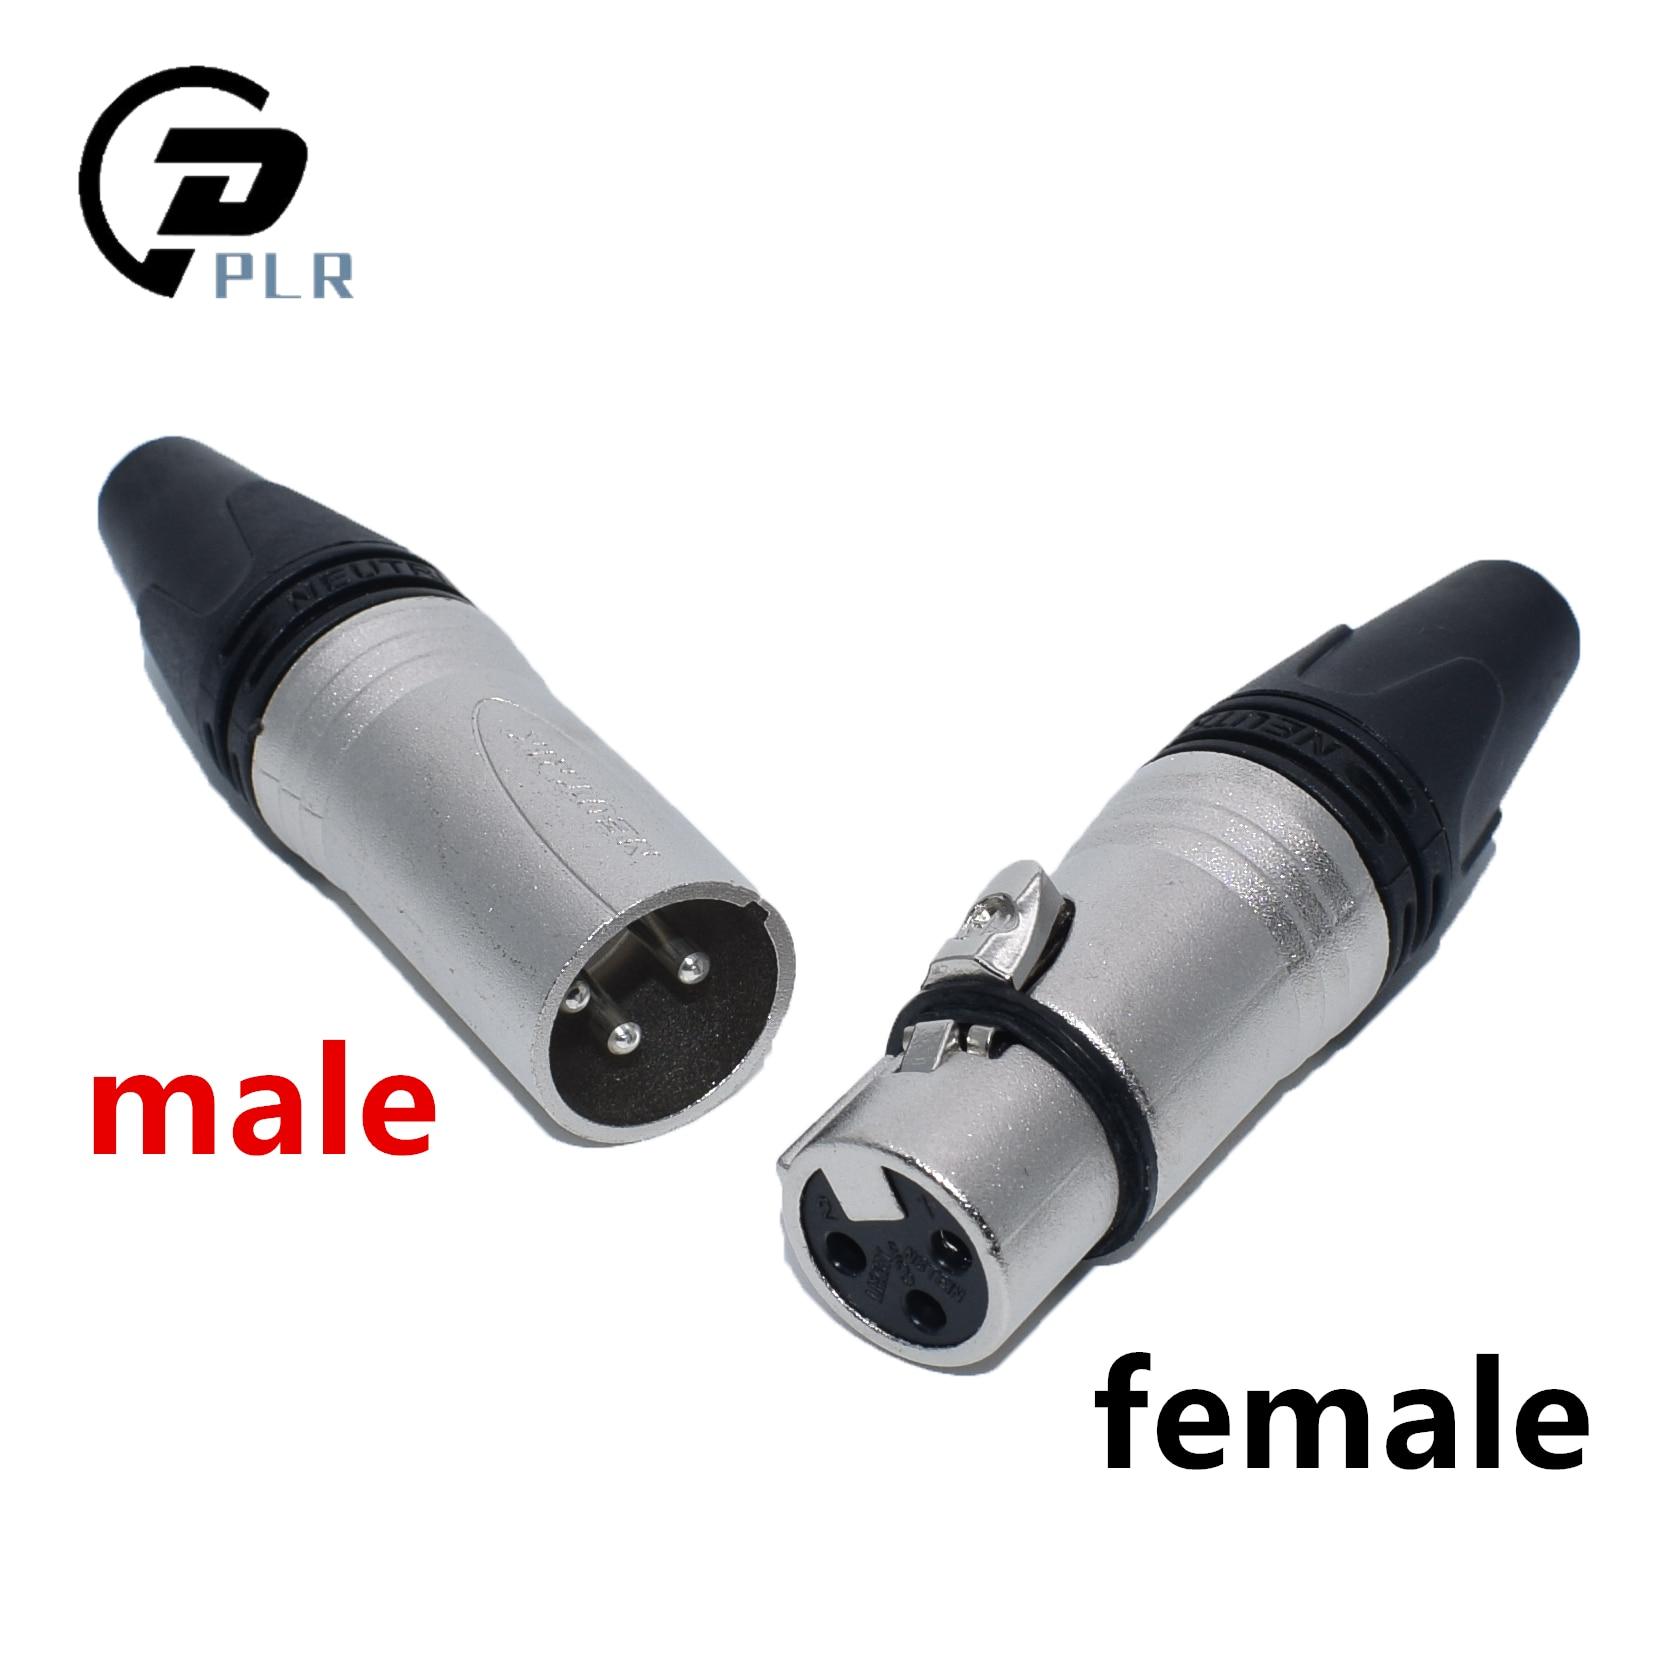 50Pcs lot 25PCS NC3MXX 25PCS NC3FXX NEUTR1K Male and female A set 3Pin XLR Connector withe